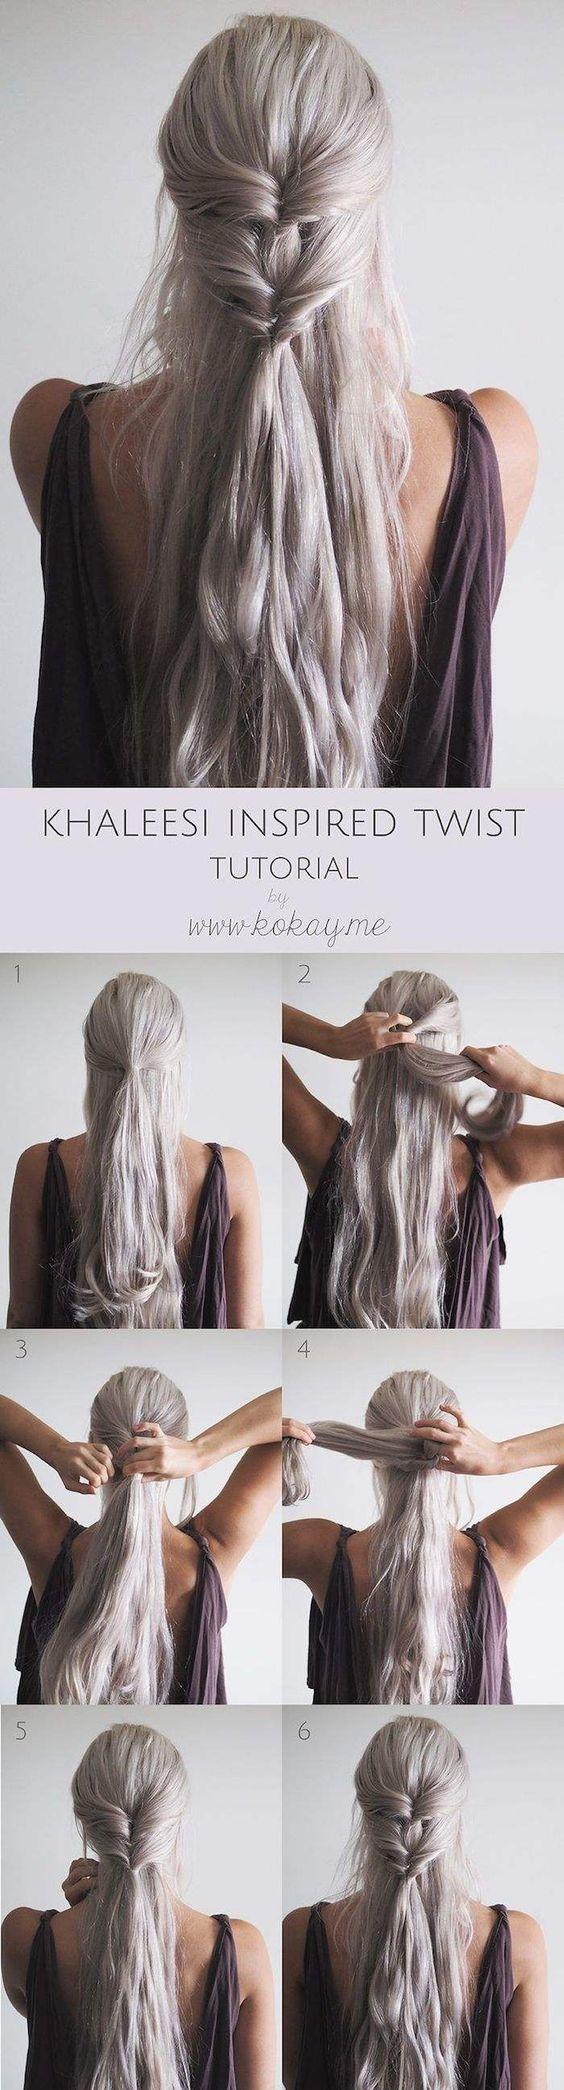 Easy half up half down hairstyles khaleesi inspired twist değişik